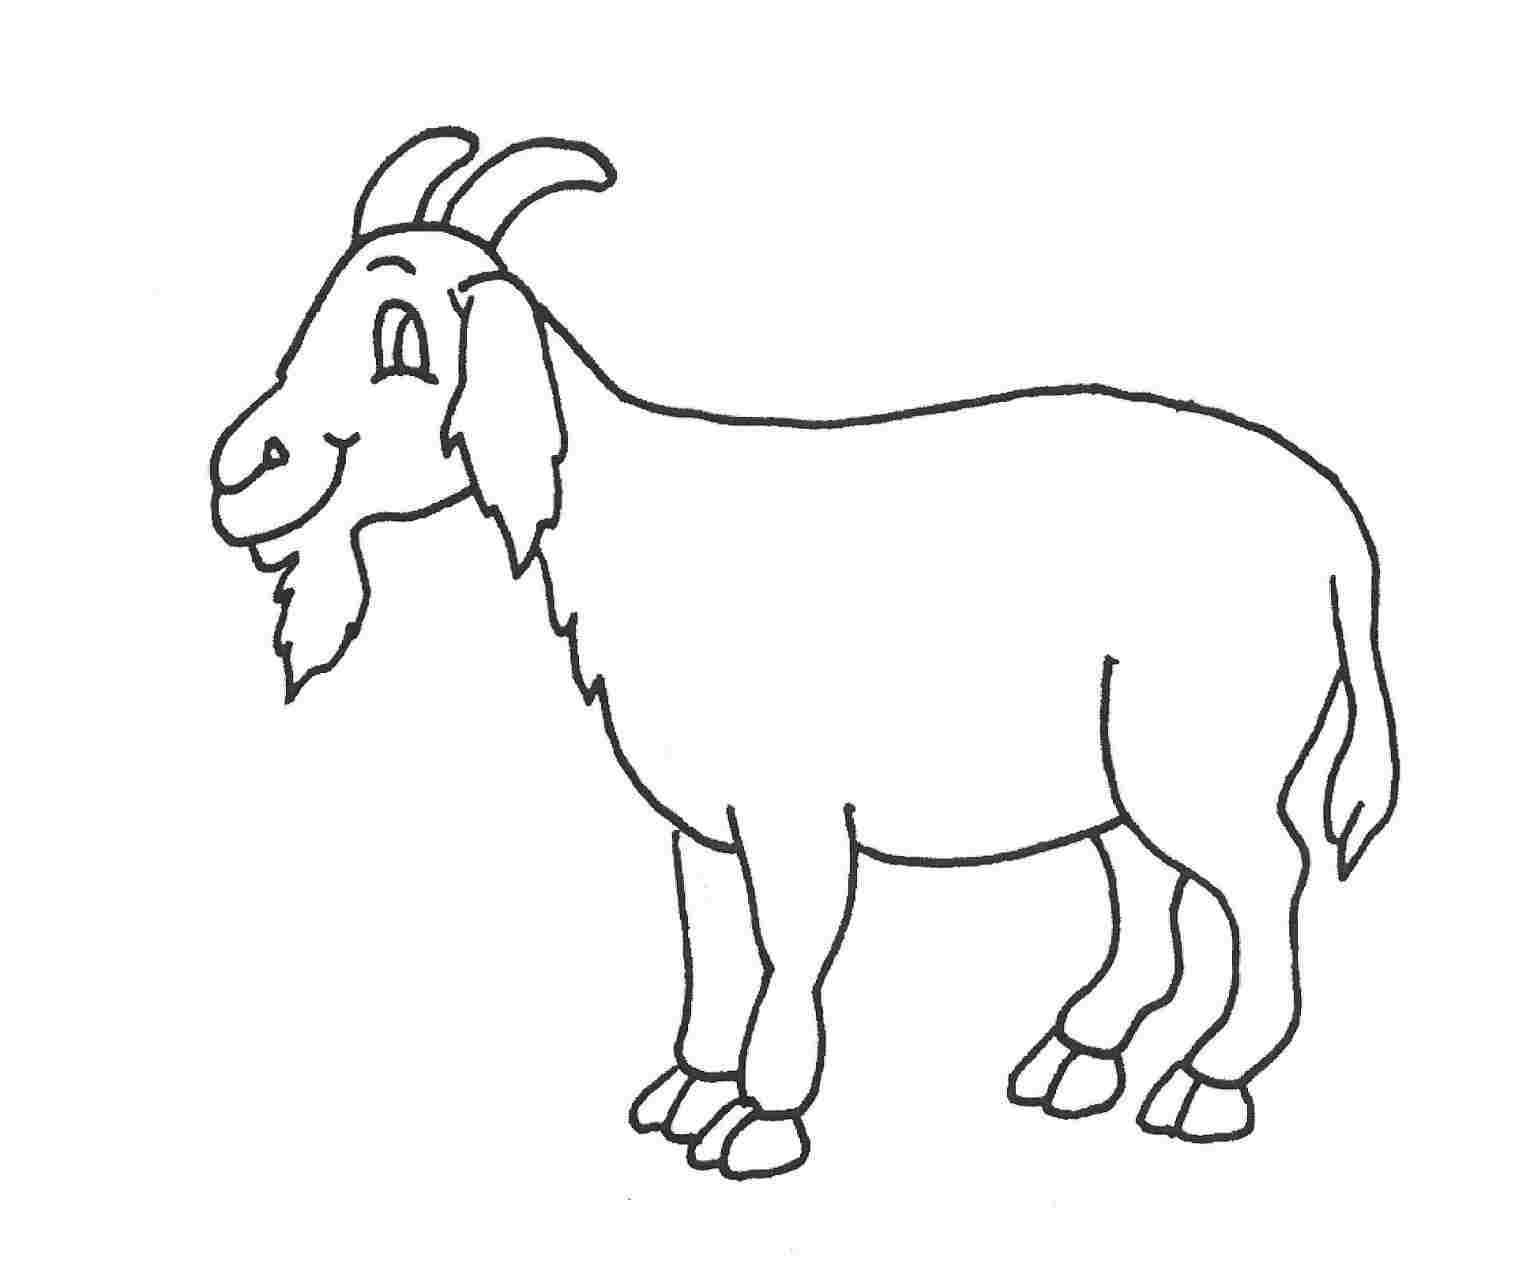 Kid goat clipart black and white 7 » Clipart Station.